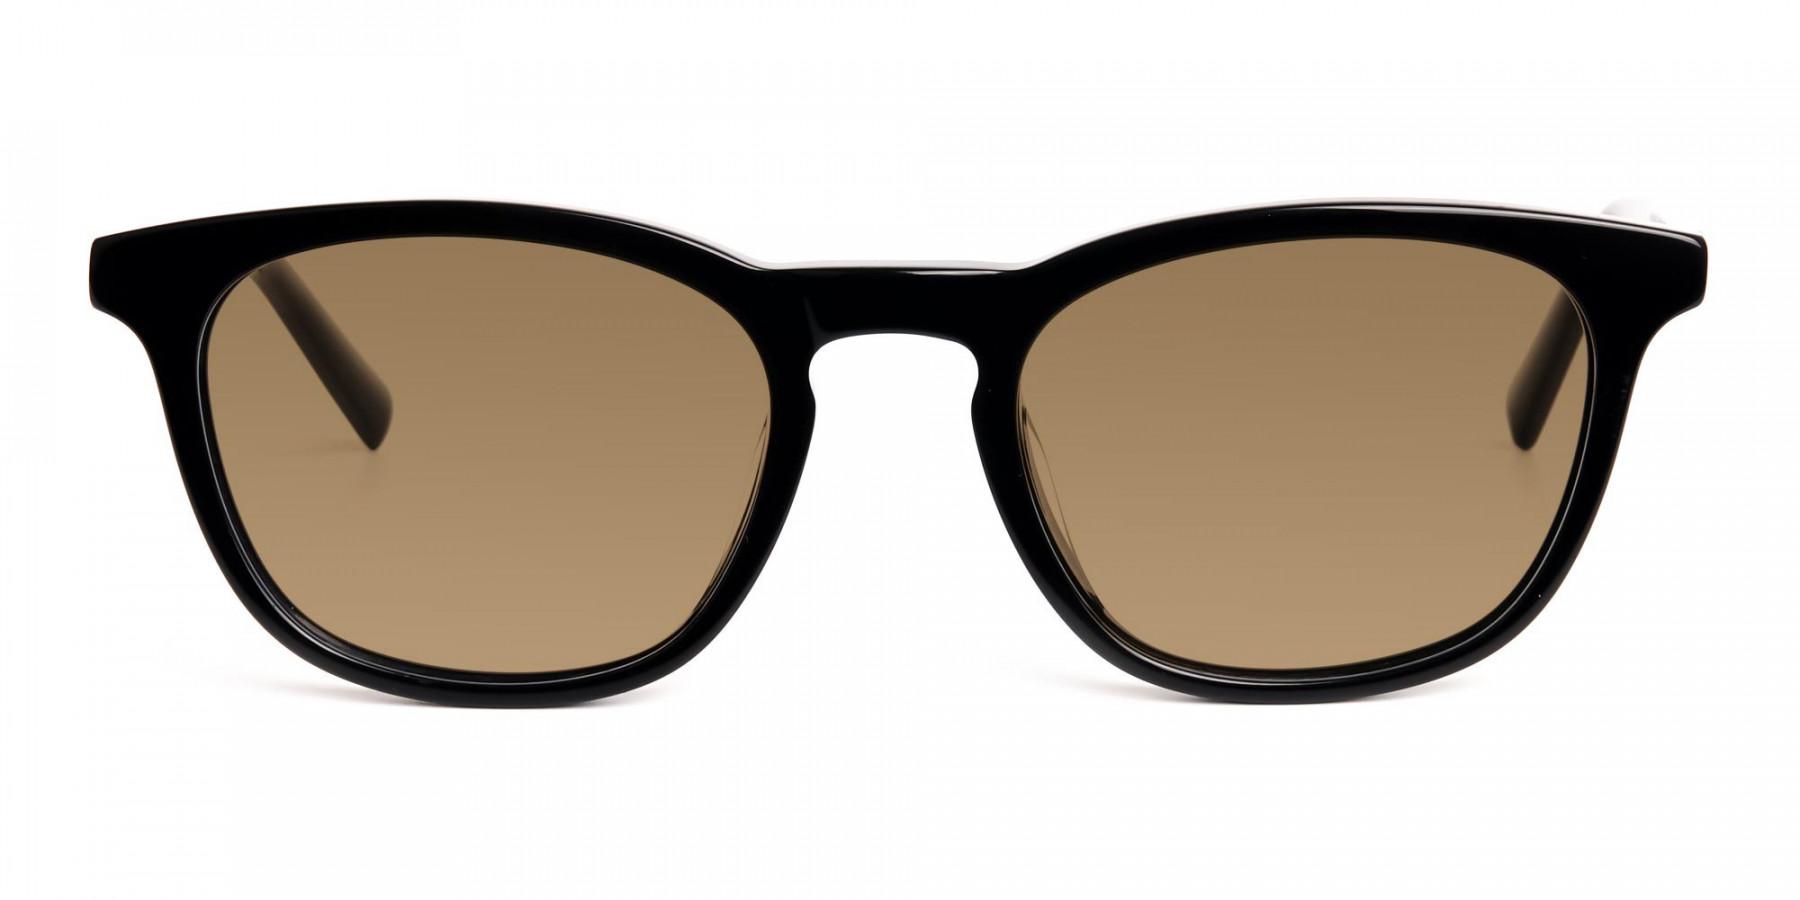 black-thick-wayfarer-dark-brown-tinted-sunglasses-frames-3